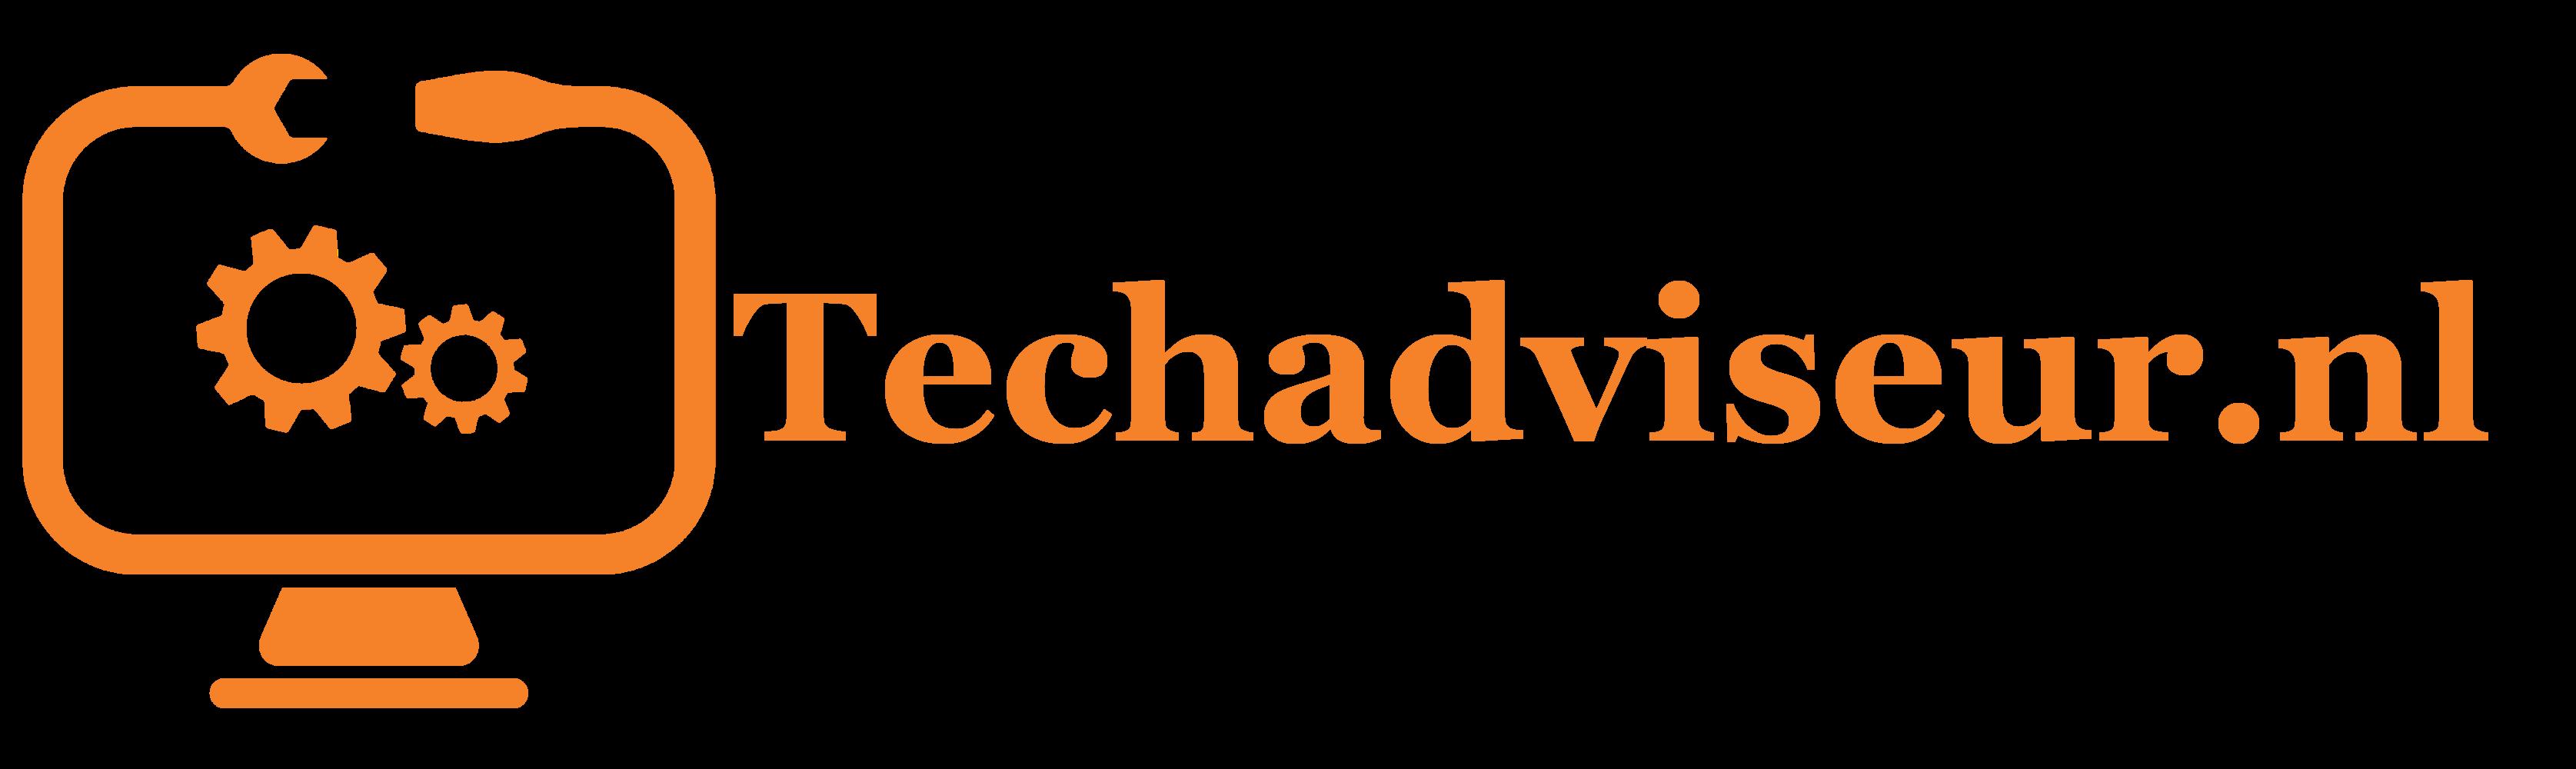 Techadviseur.nl